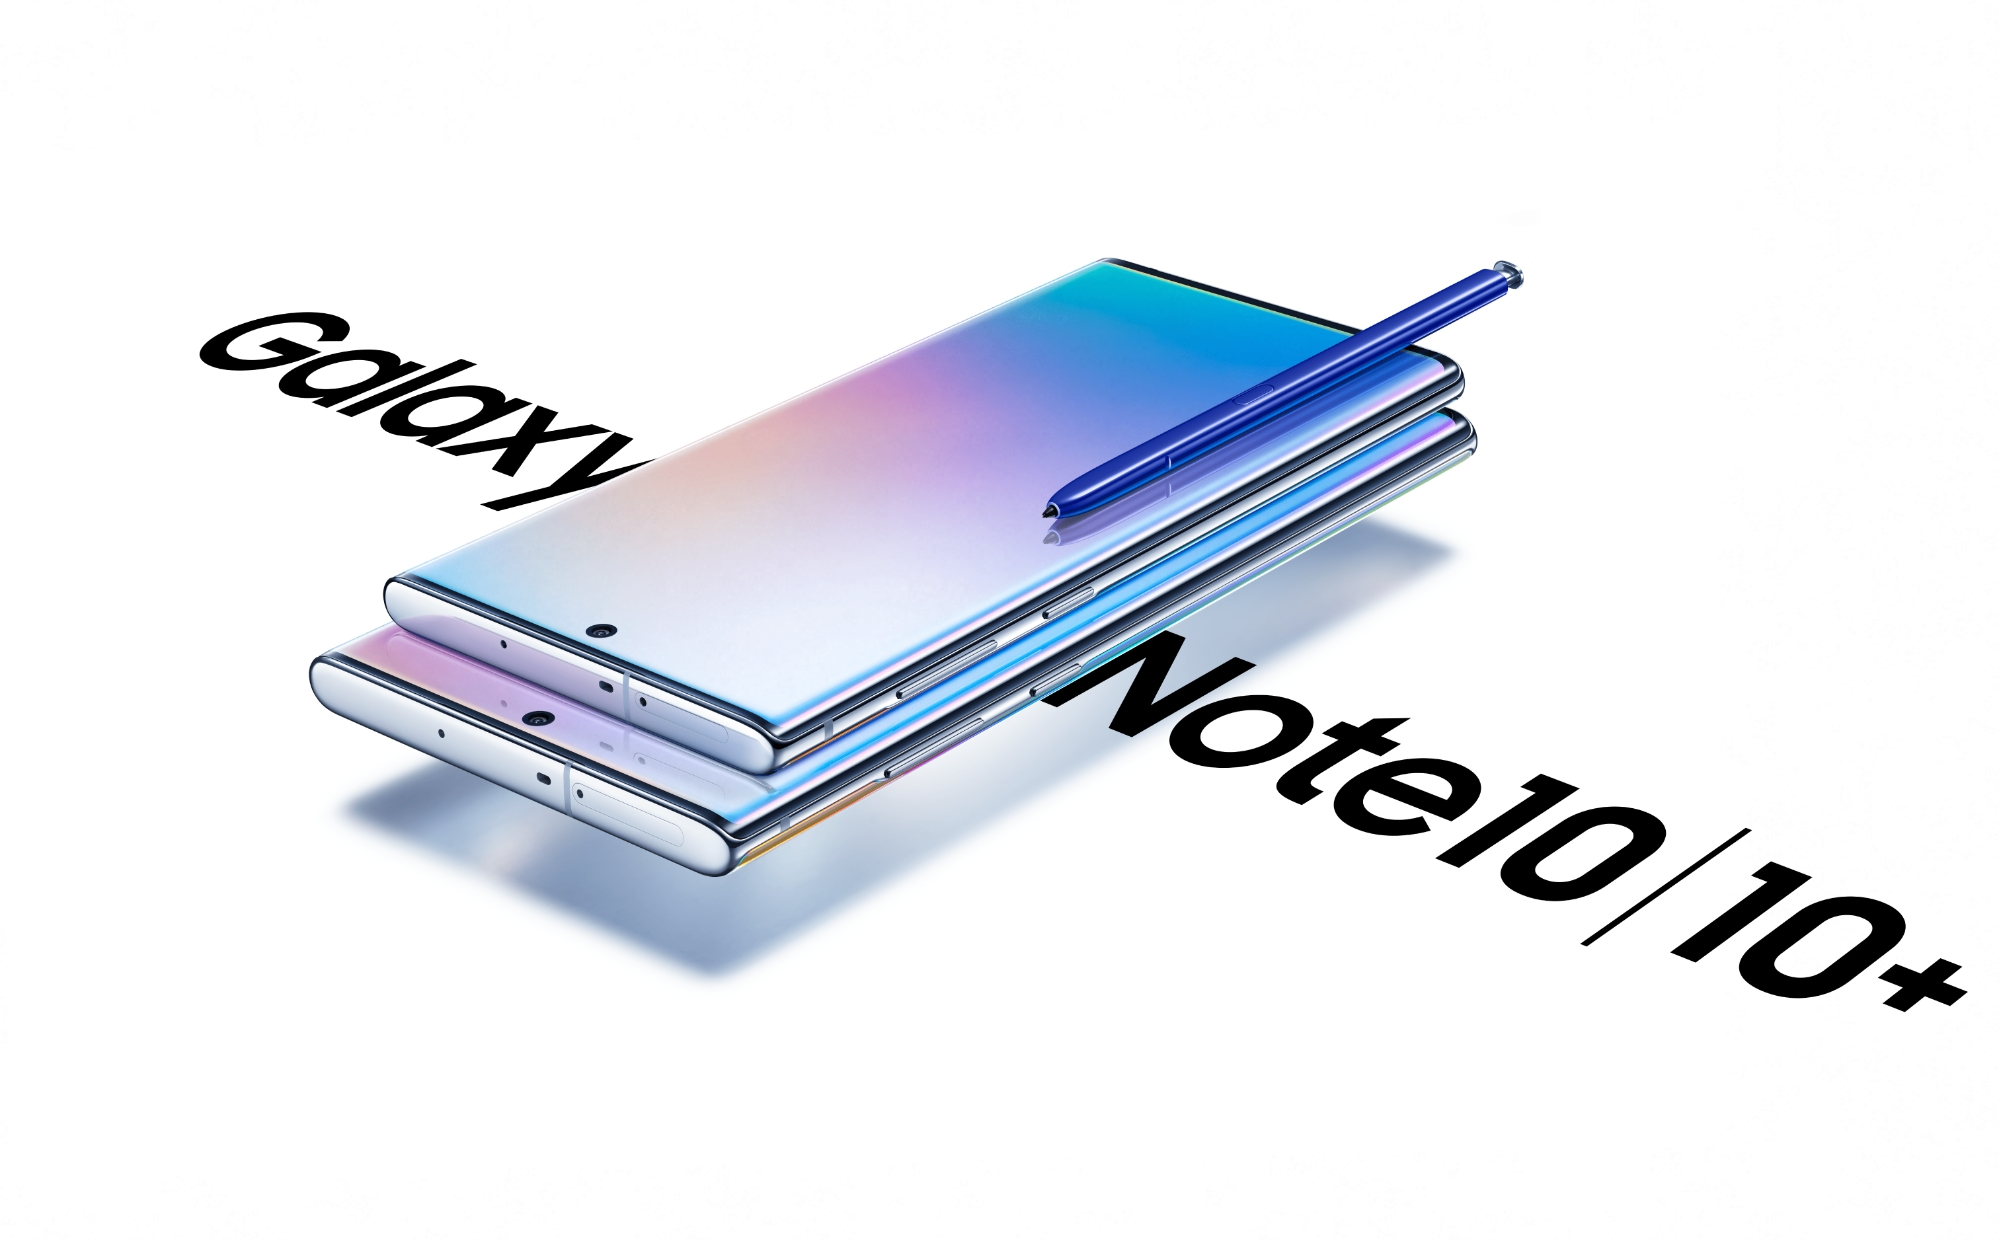 Оболочка One UI 3.1 добралась до Galaxy Note 10 и Galaxy Note 10+